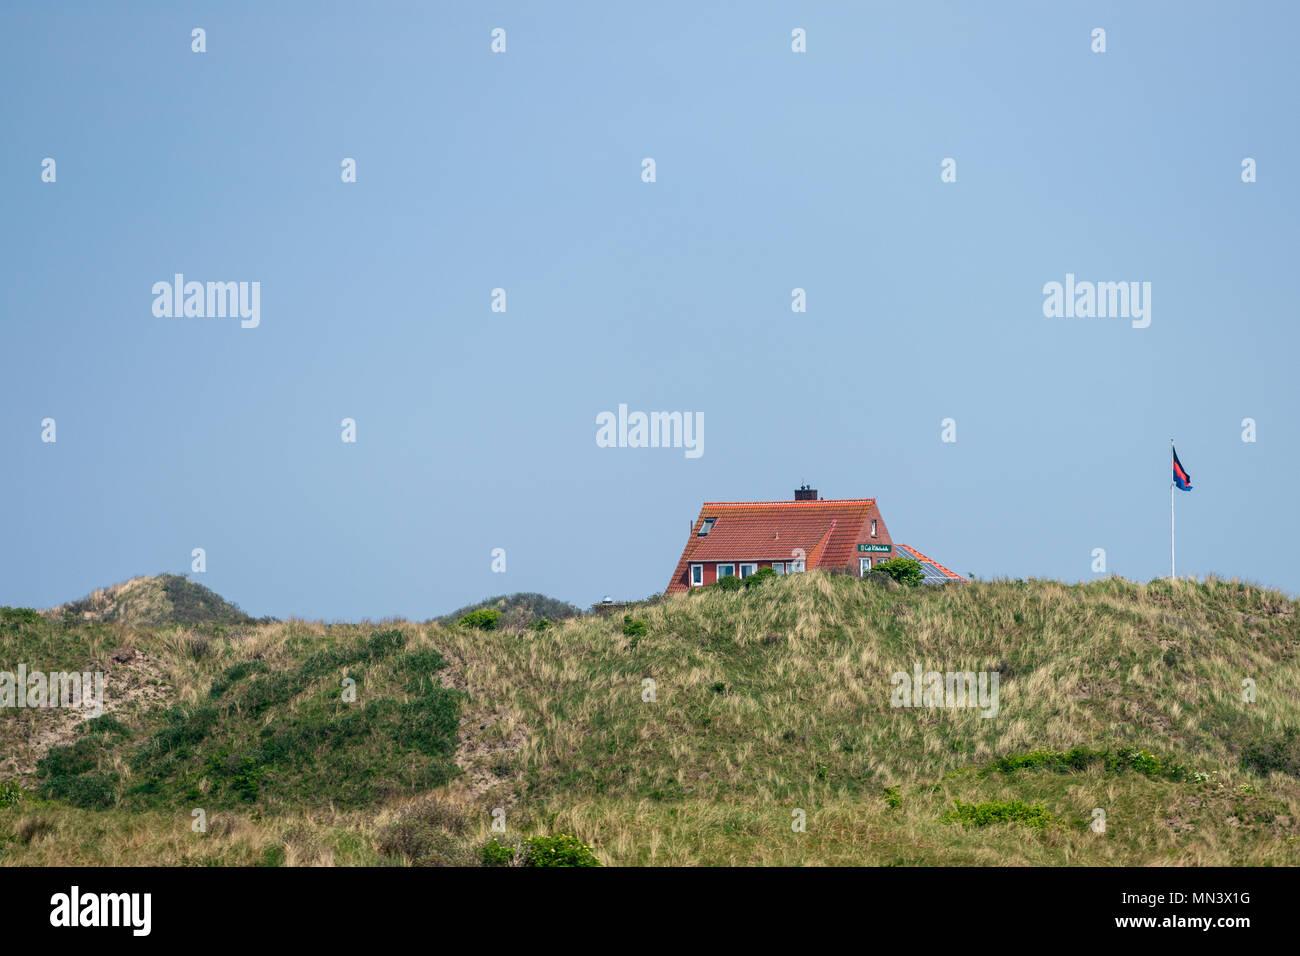 Island of Juist Germany. Insel Juist - Wattenmeer der Nordsee. - Stock Image